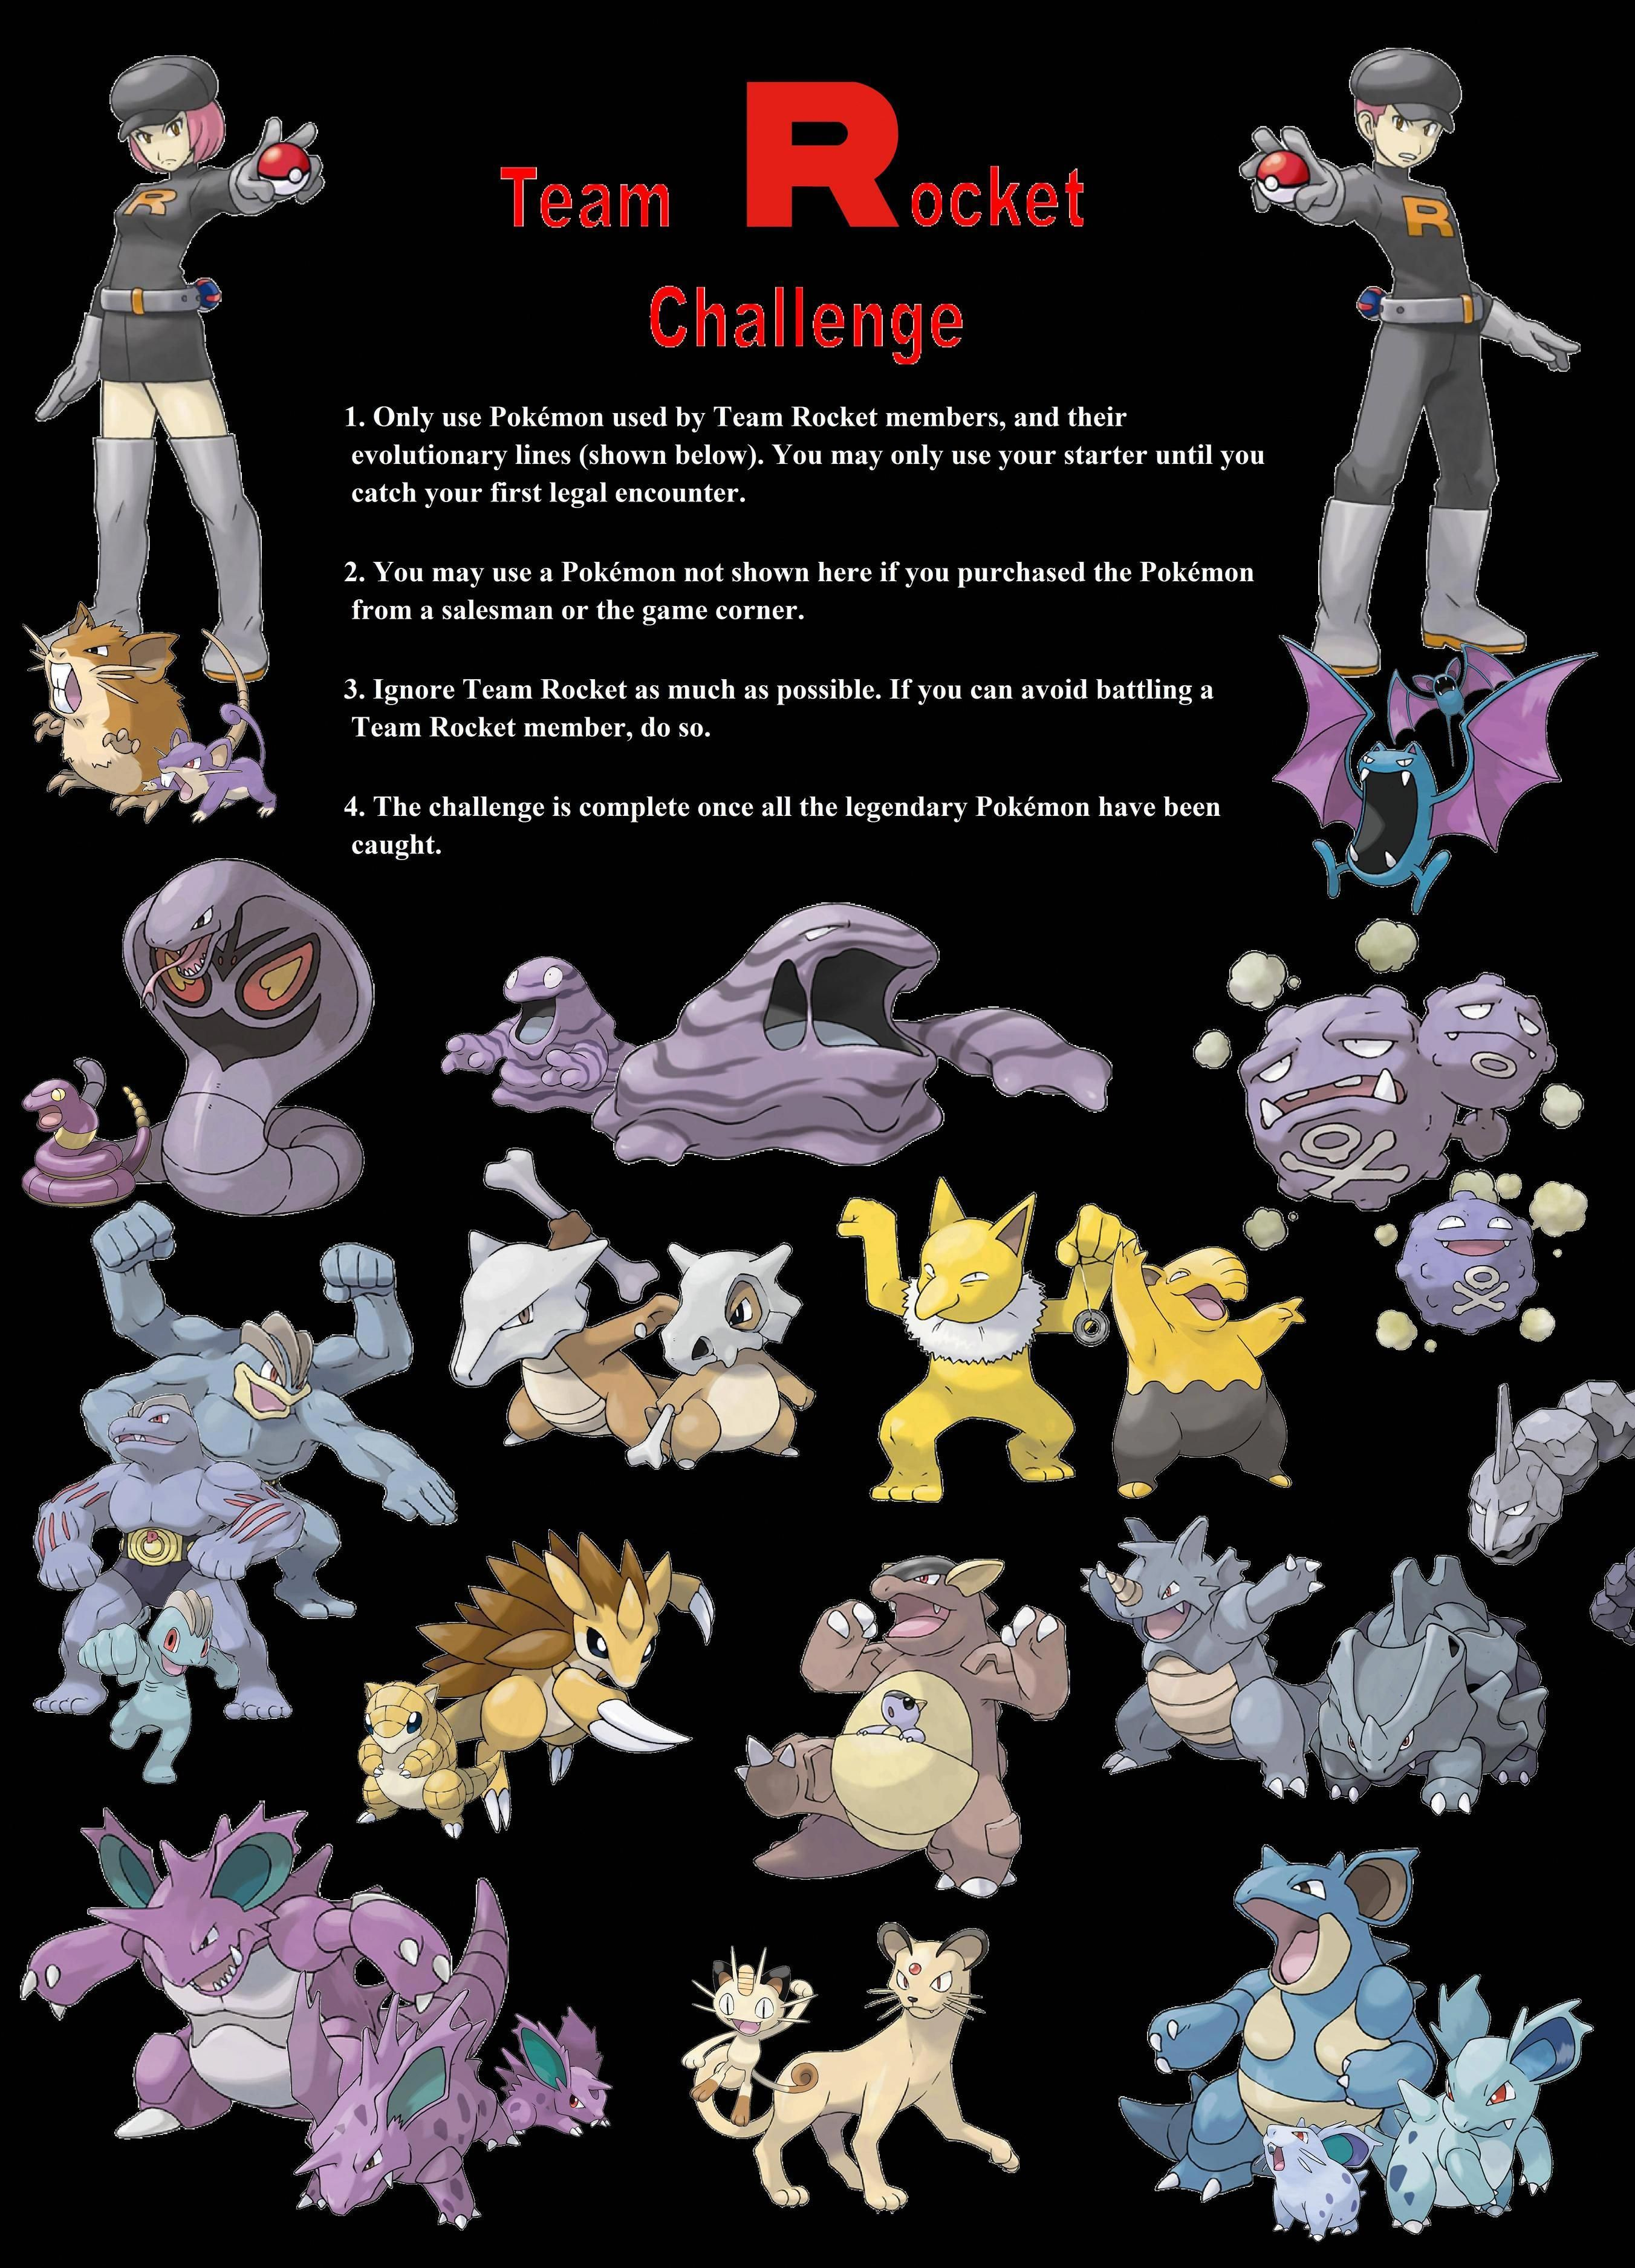 videogamememes Pokemon, Pokemon teams, Pokemon challenge